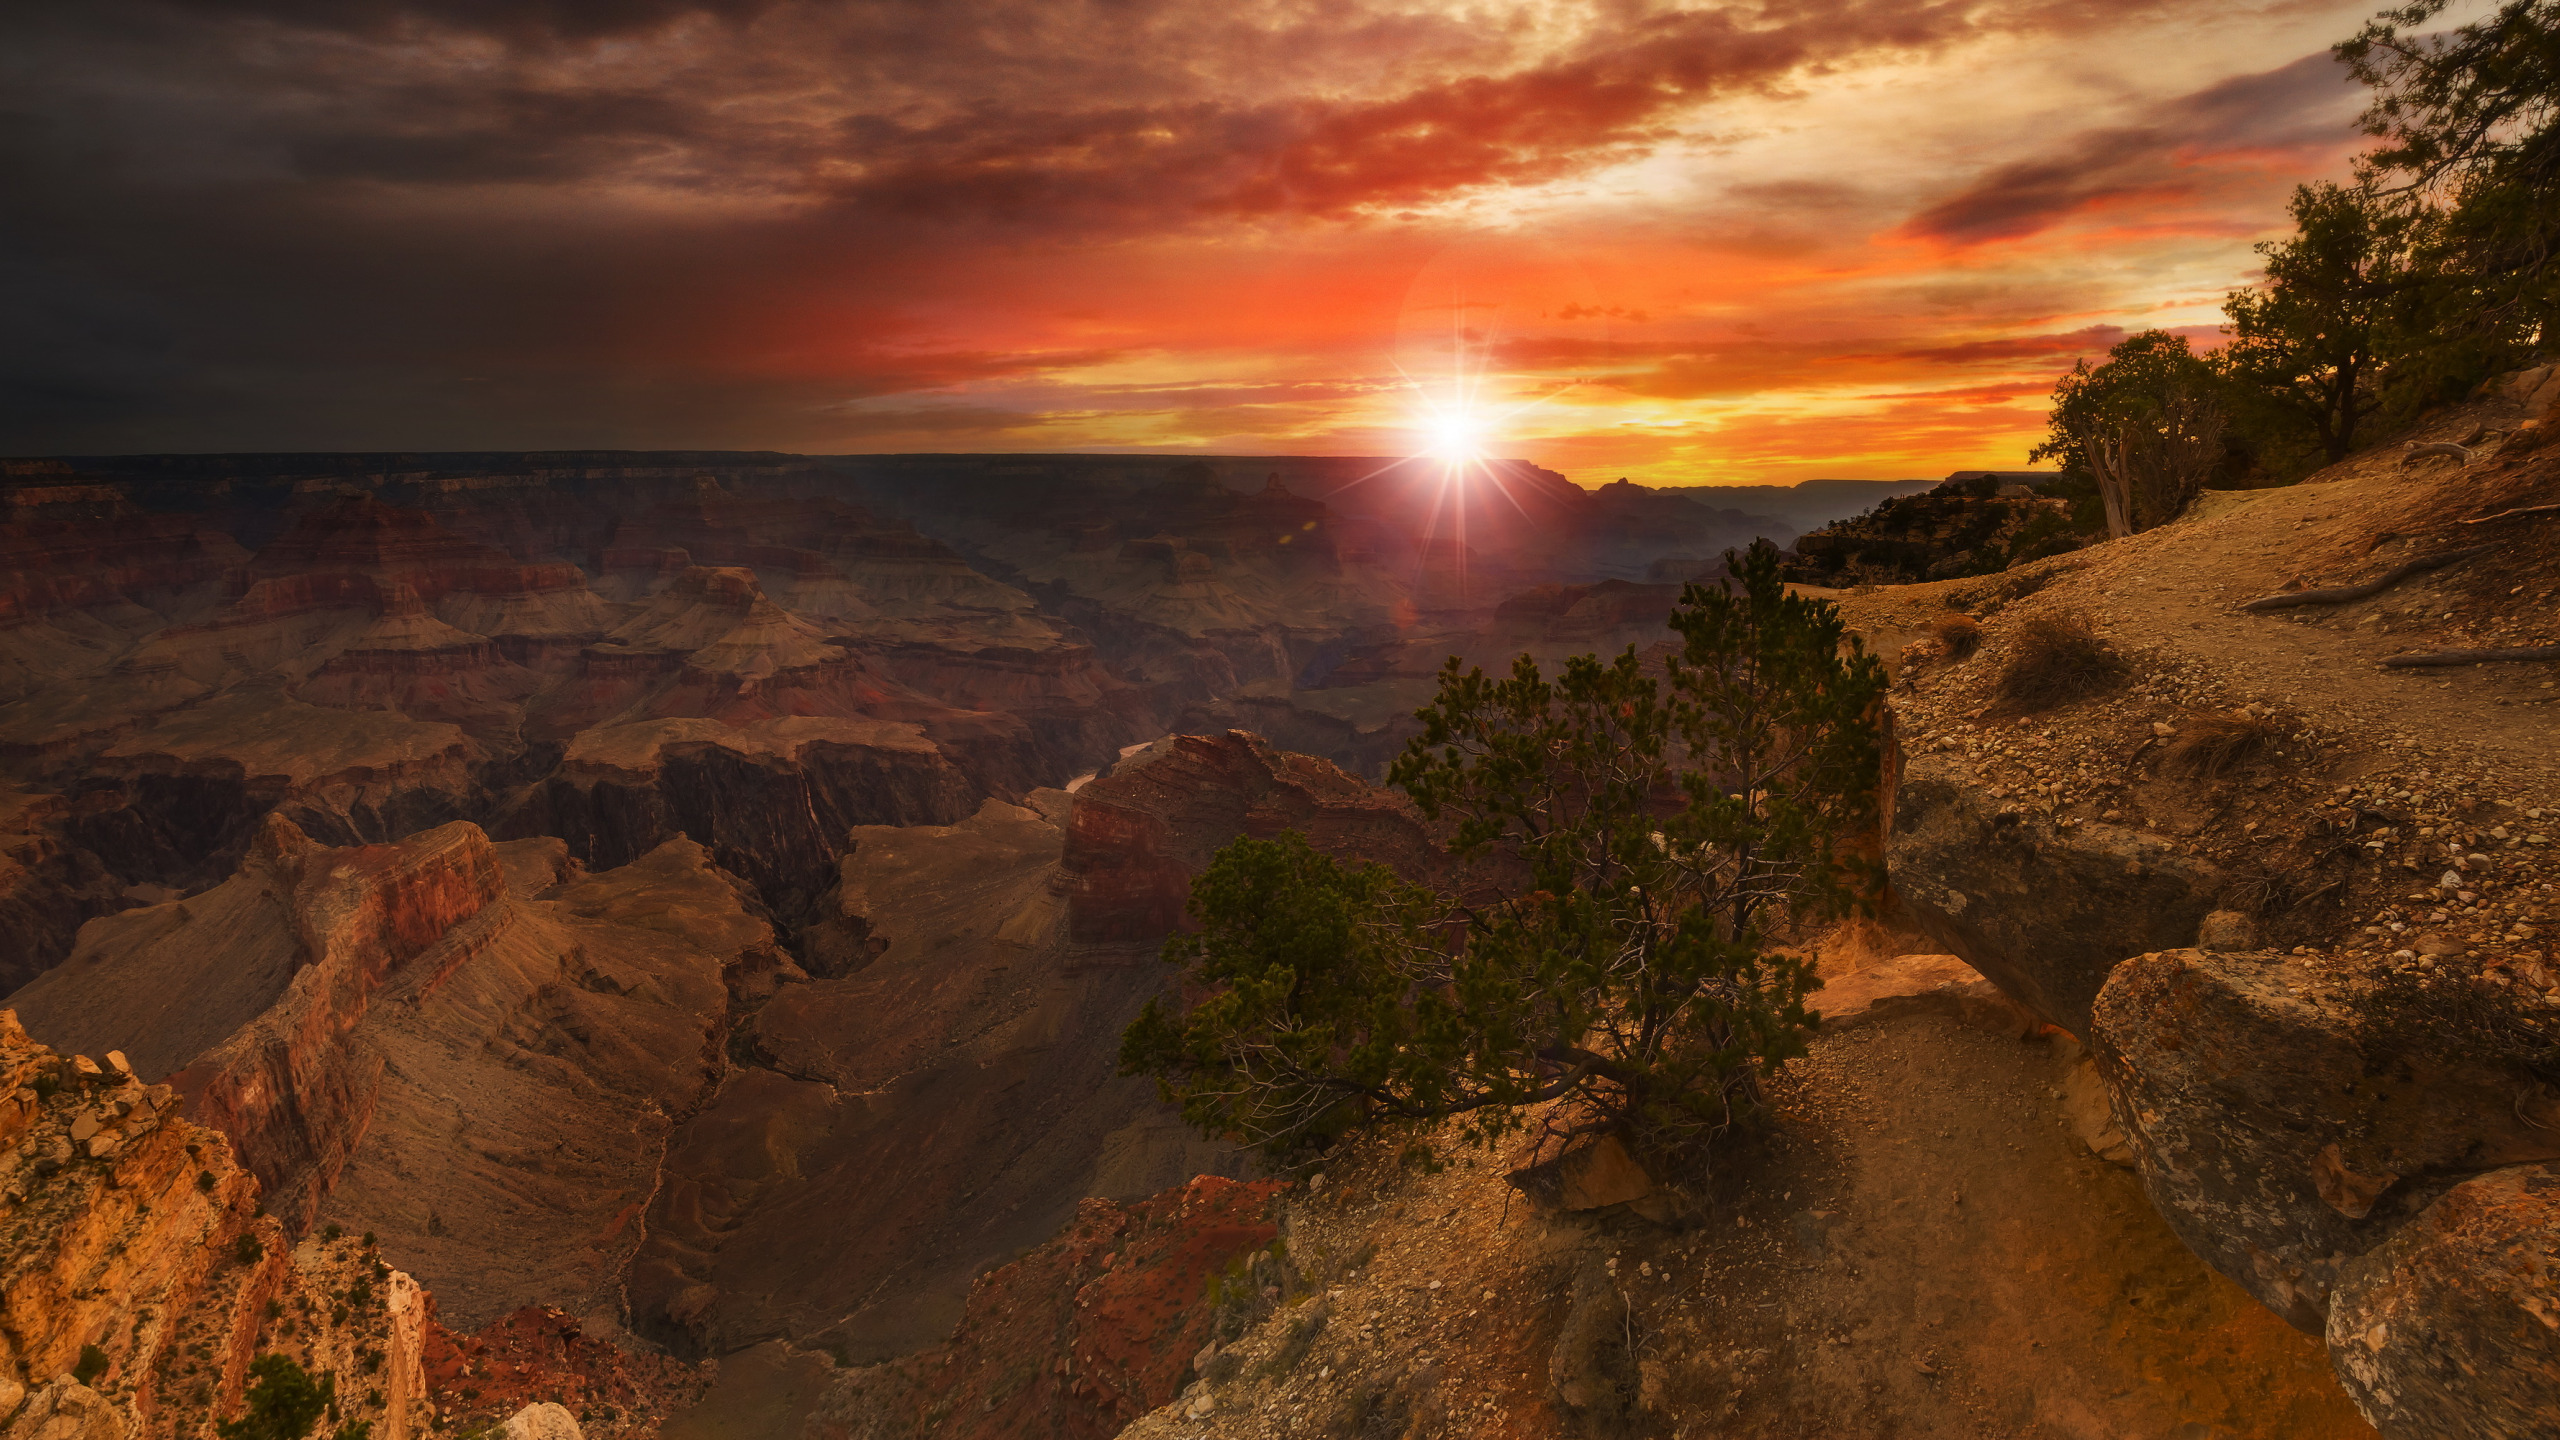 солнце каньон песок the sun canyon sand  № 2562935 бесплатно